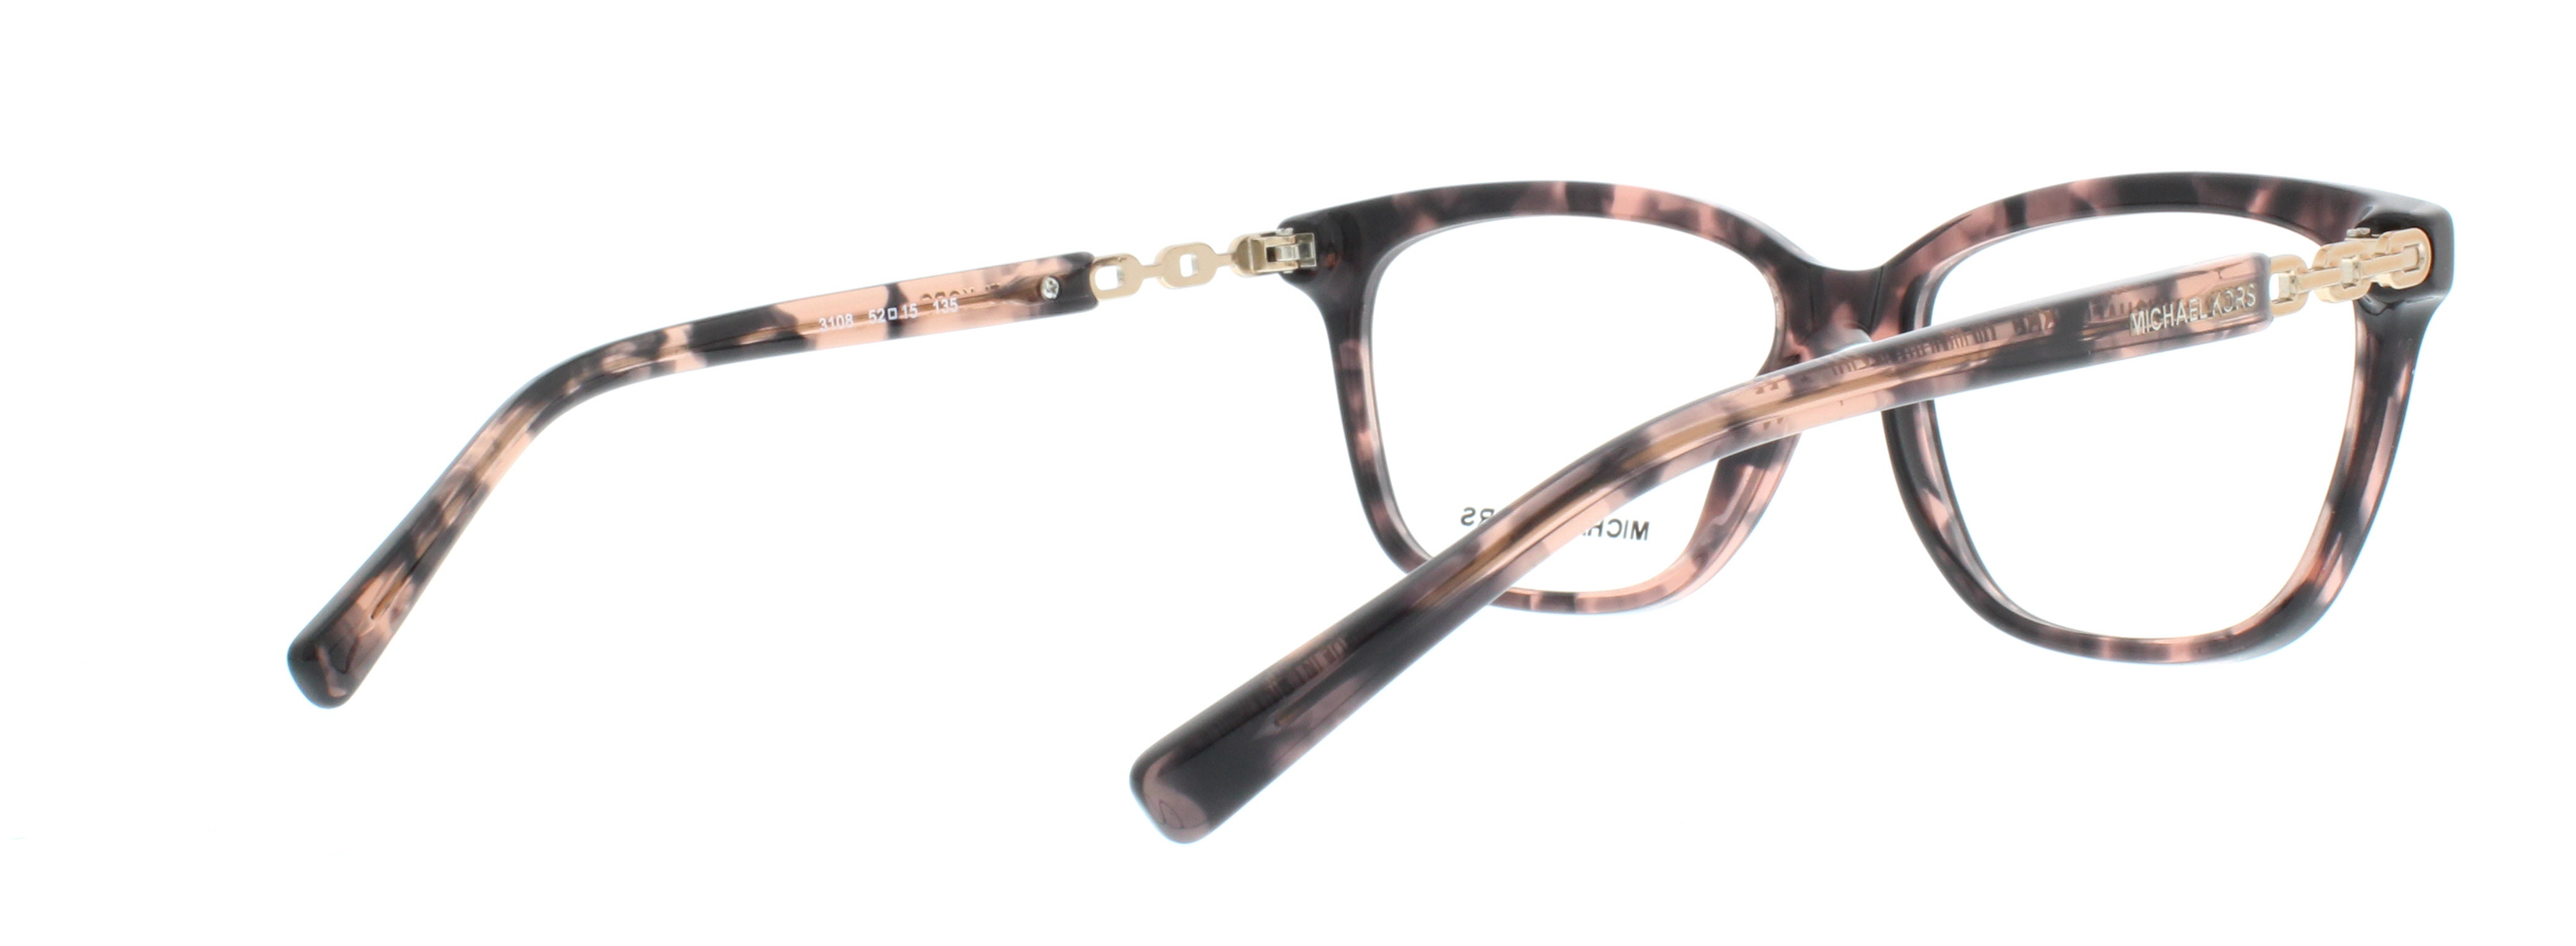 MICHAEL KORS Eyeglasses MK8018 SABINA IV 3108 Pink Tortoise/Rose ...